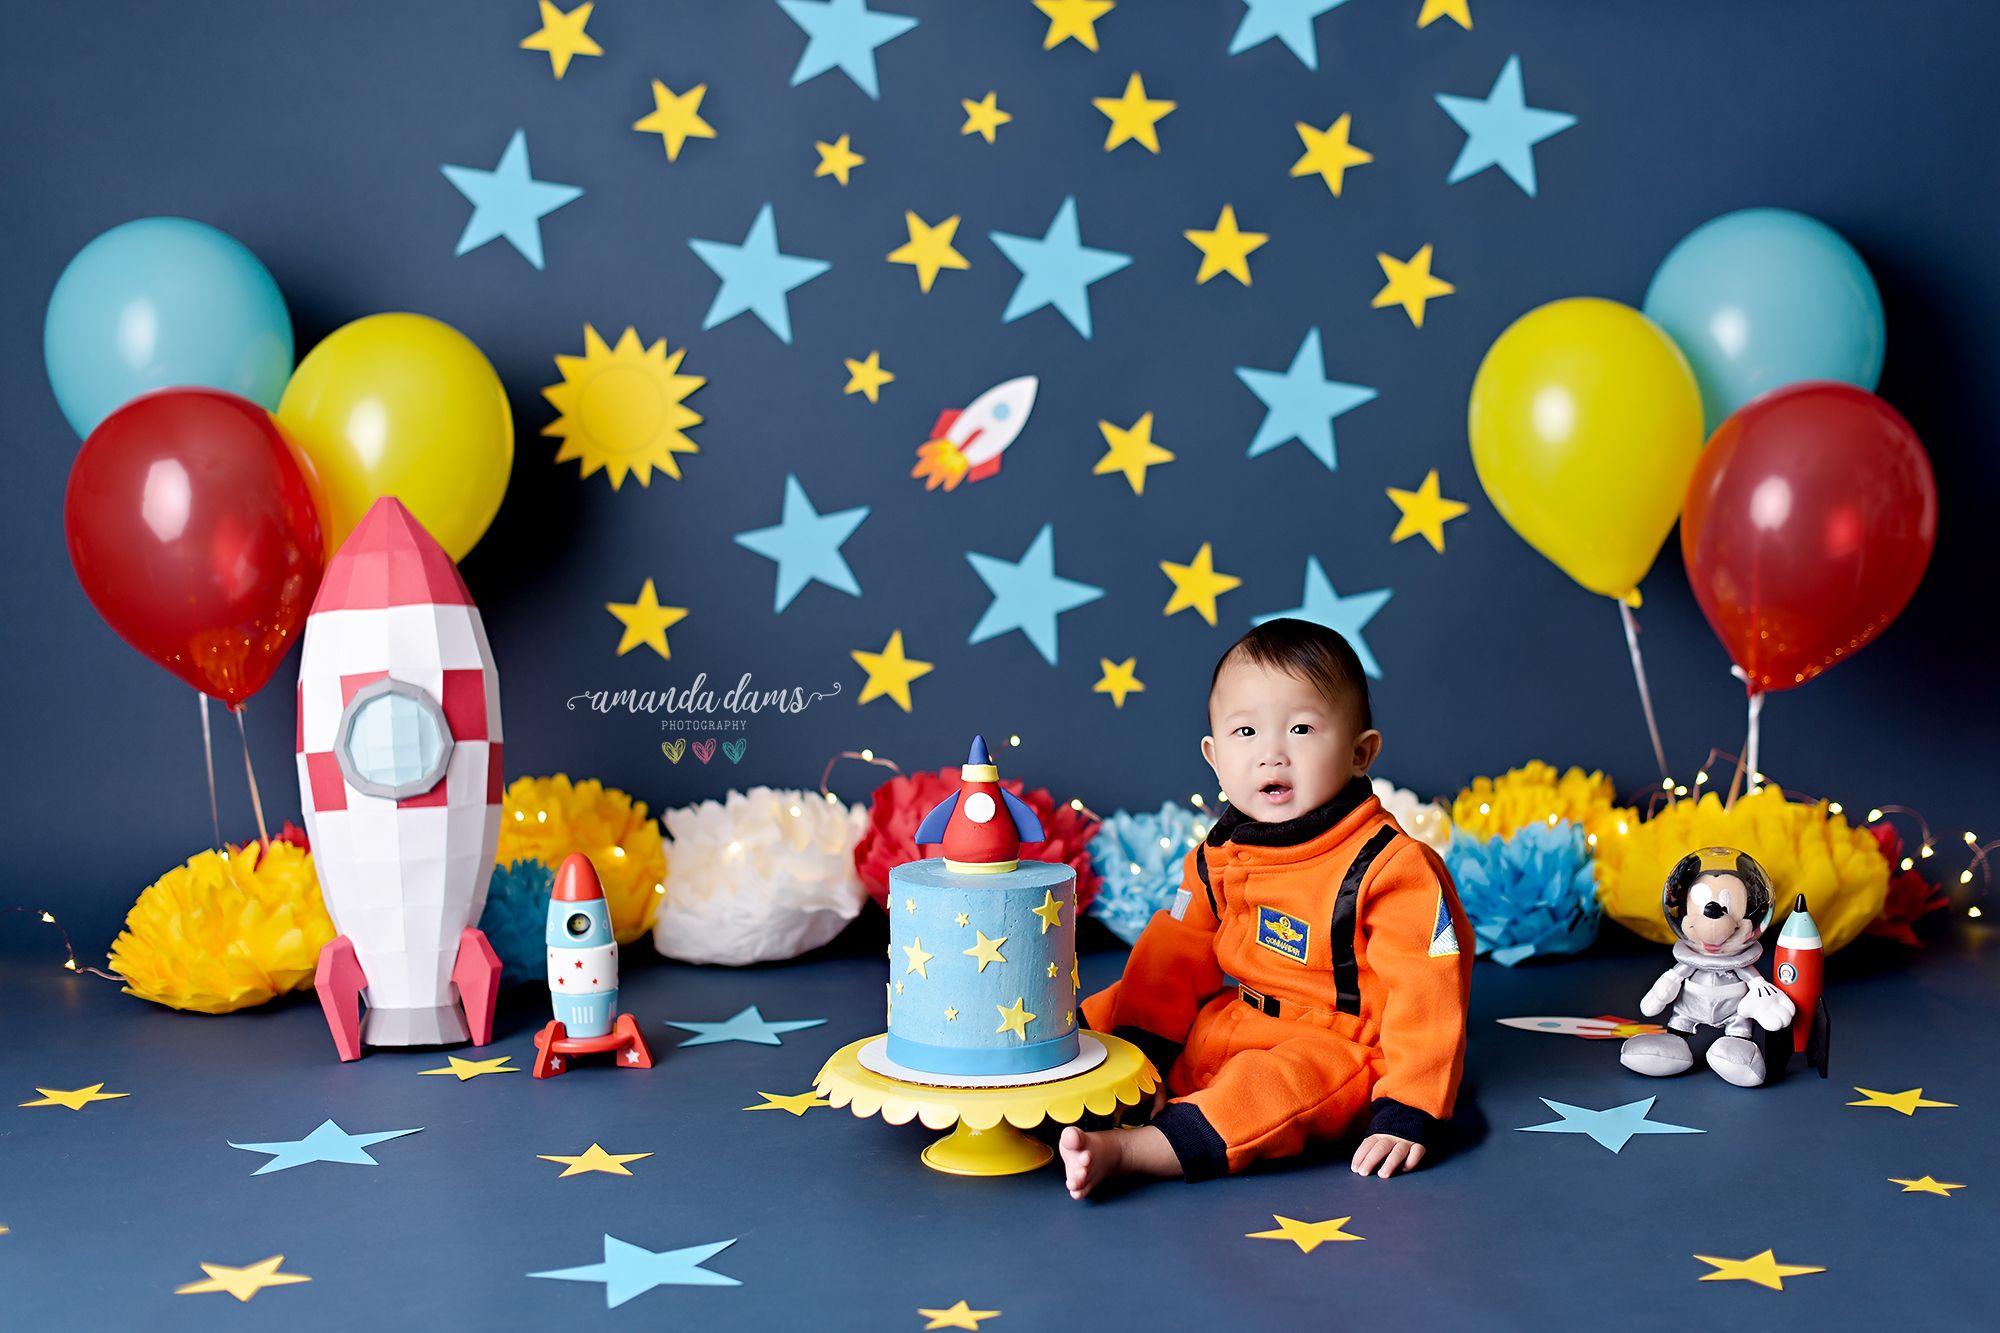 Outer Space Astronaut Cake Smash Inspiration Ideas